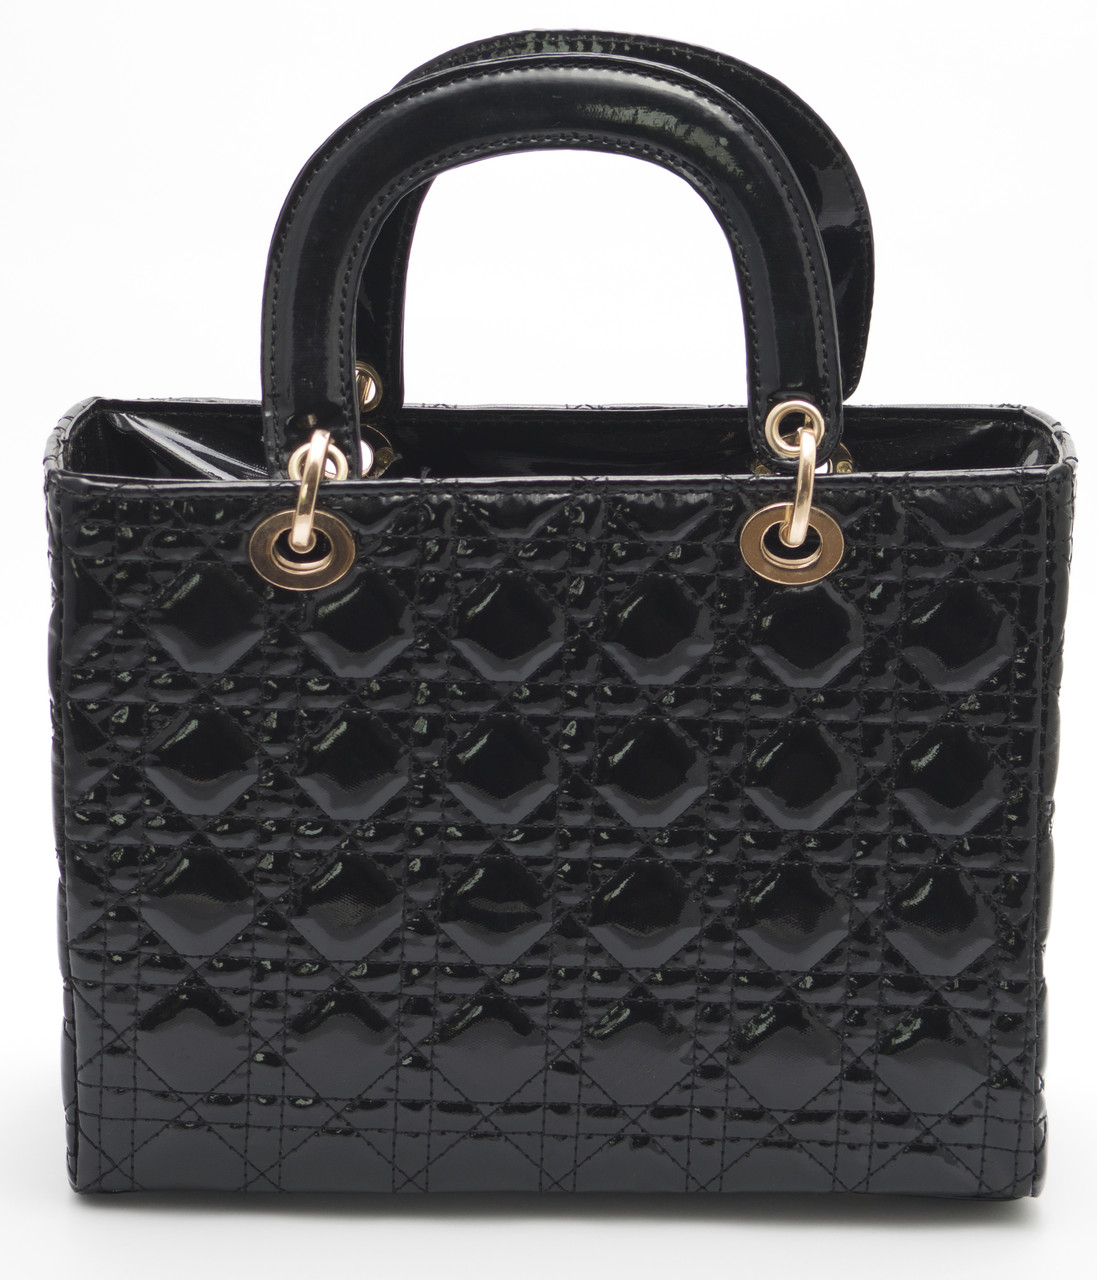 Элегантная женская черная лаковая сумка  Б/Н art.0-1